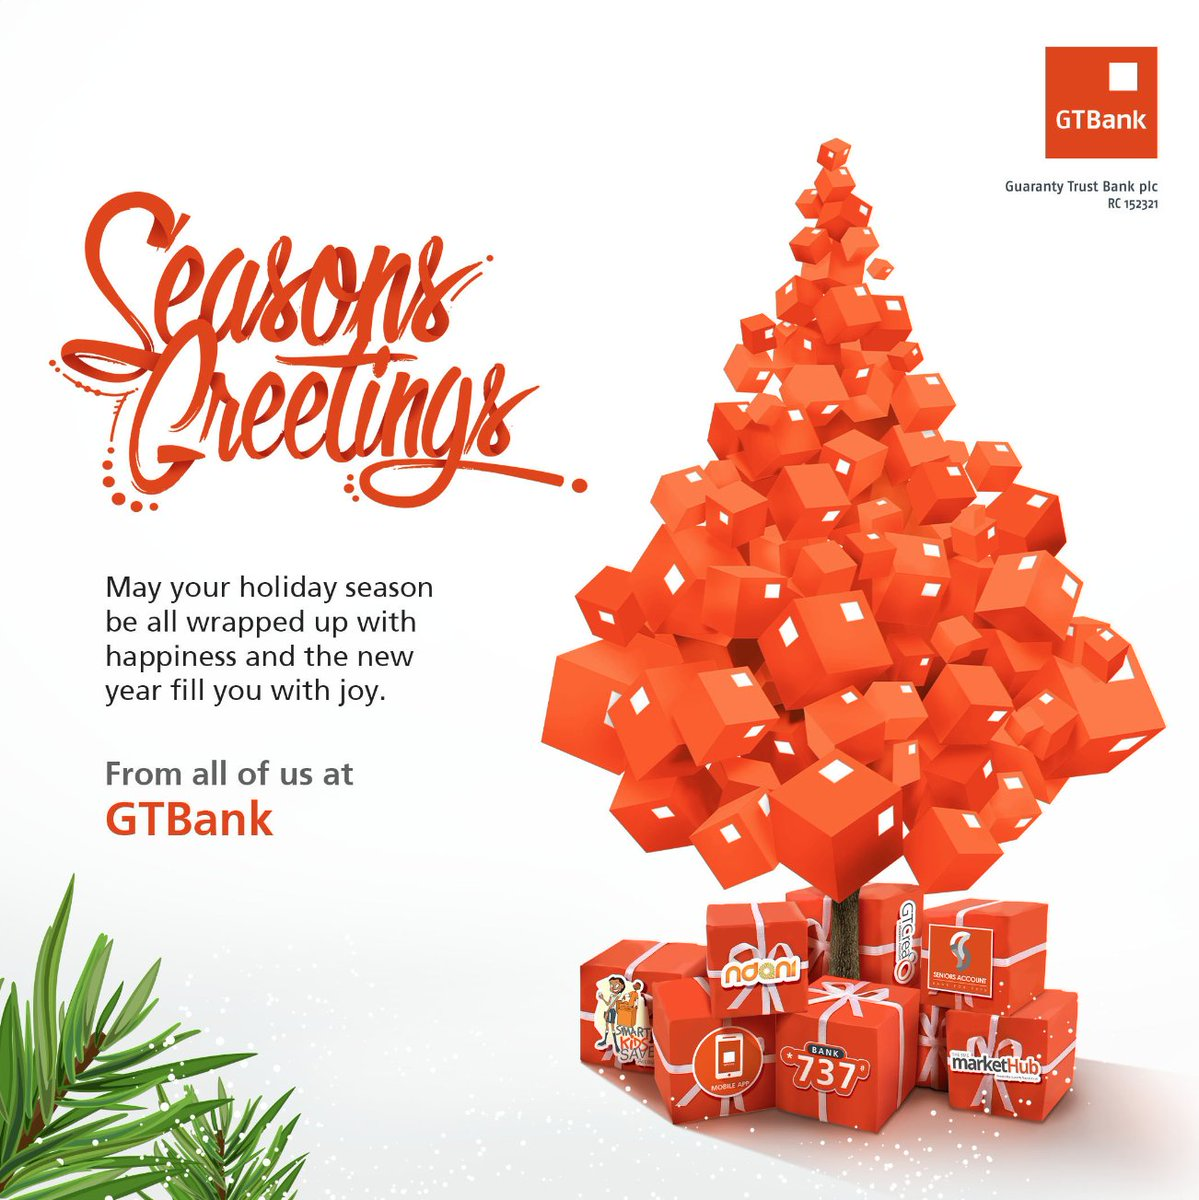 Guaranty trust bank on twitter seasons greetings fron all of us guaranty trust bank on twitter seasons greetings fron all of us at gtbank kristyandbryce Images